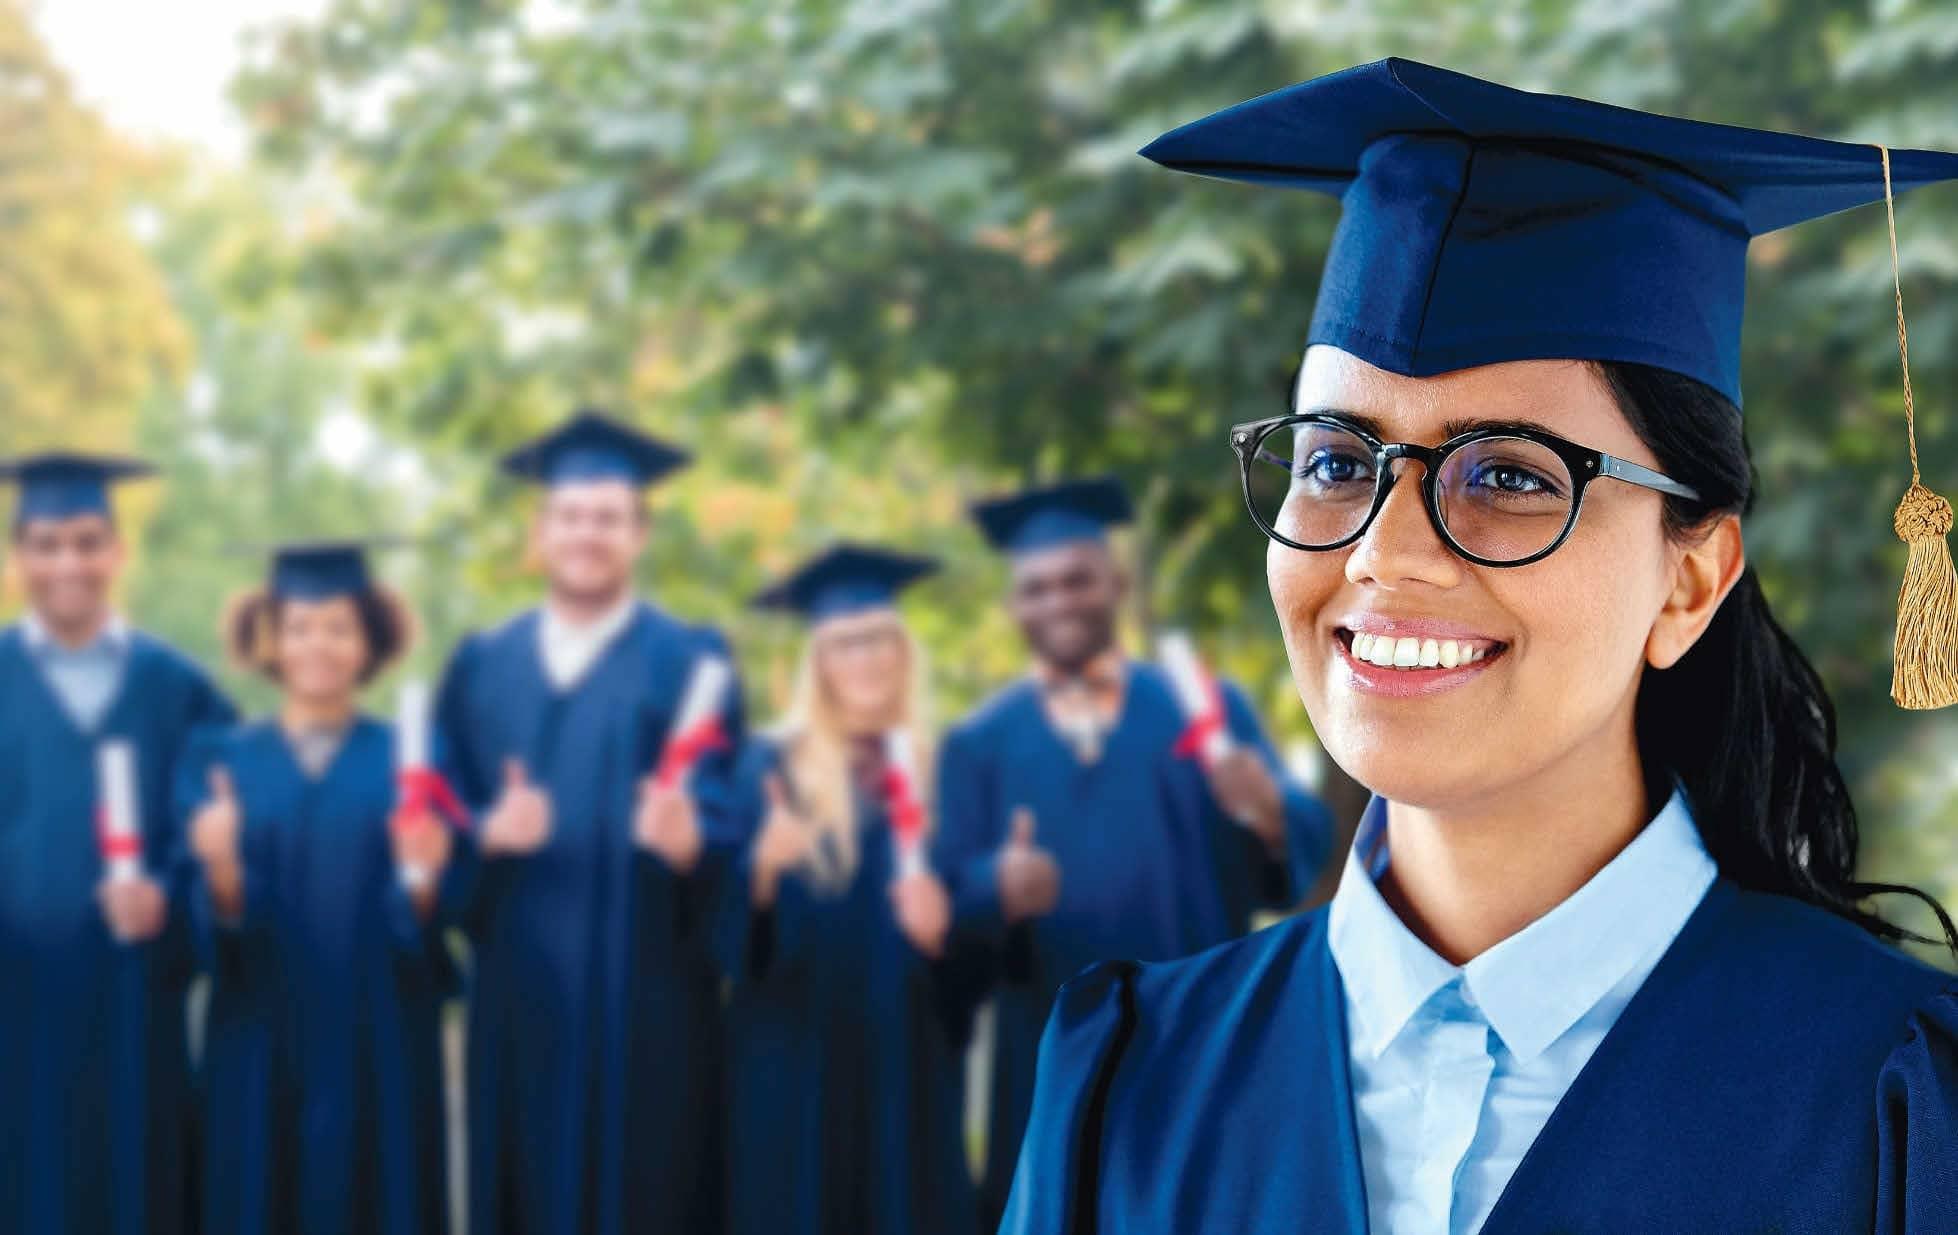 Karnataka: India's Preferred Destination For Professional Education